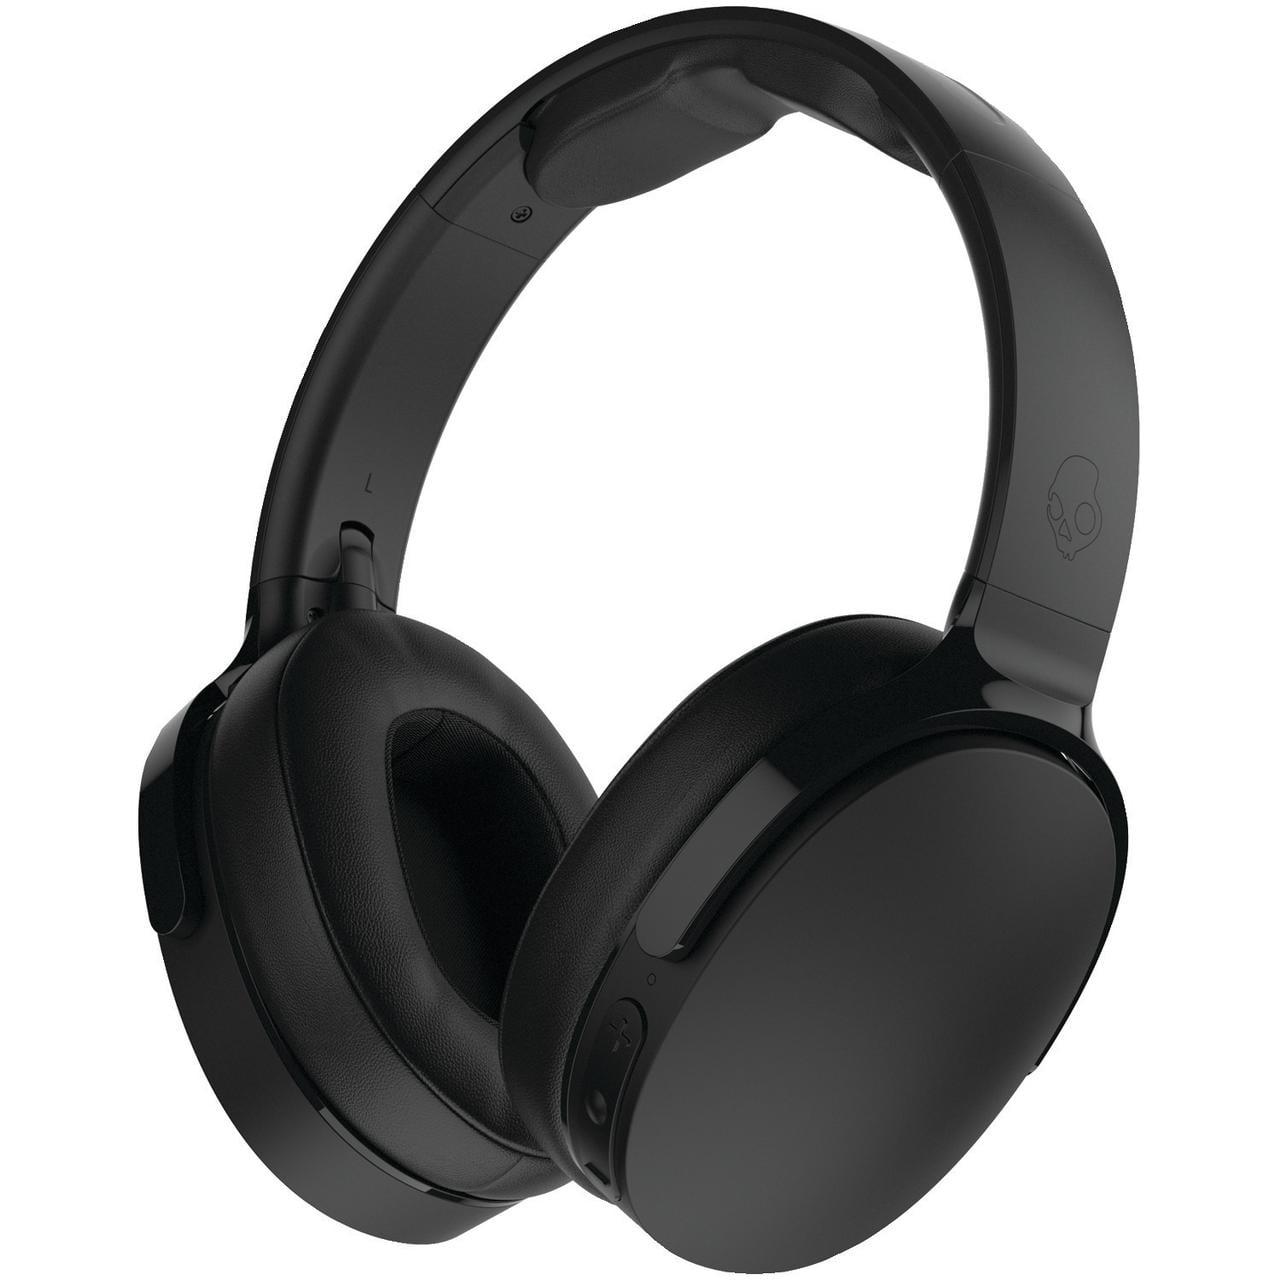 Skullcandy S6HTW-K033 Hesh 3 Bluetooth Over-the-Ear Headphones with Microphone